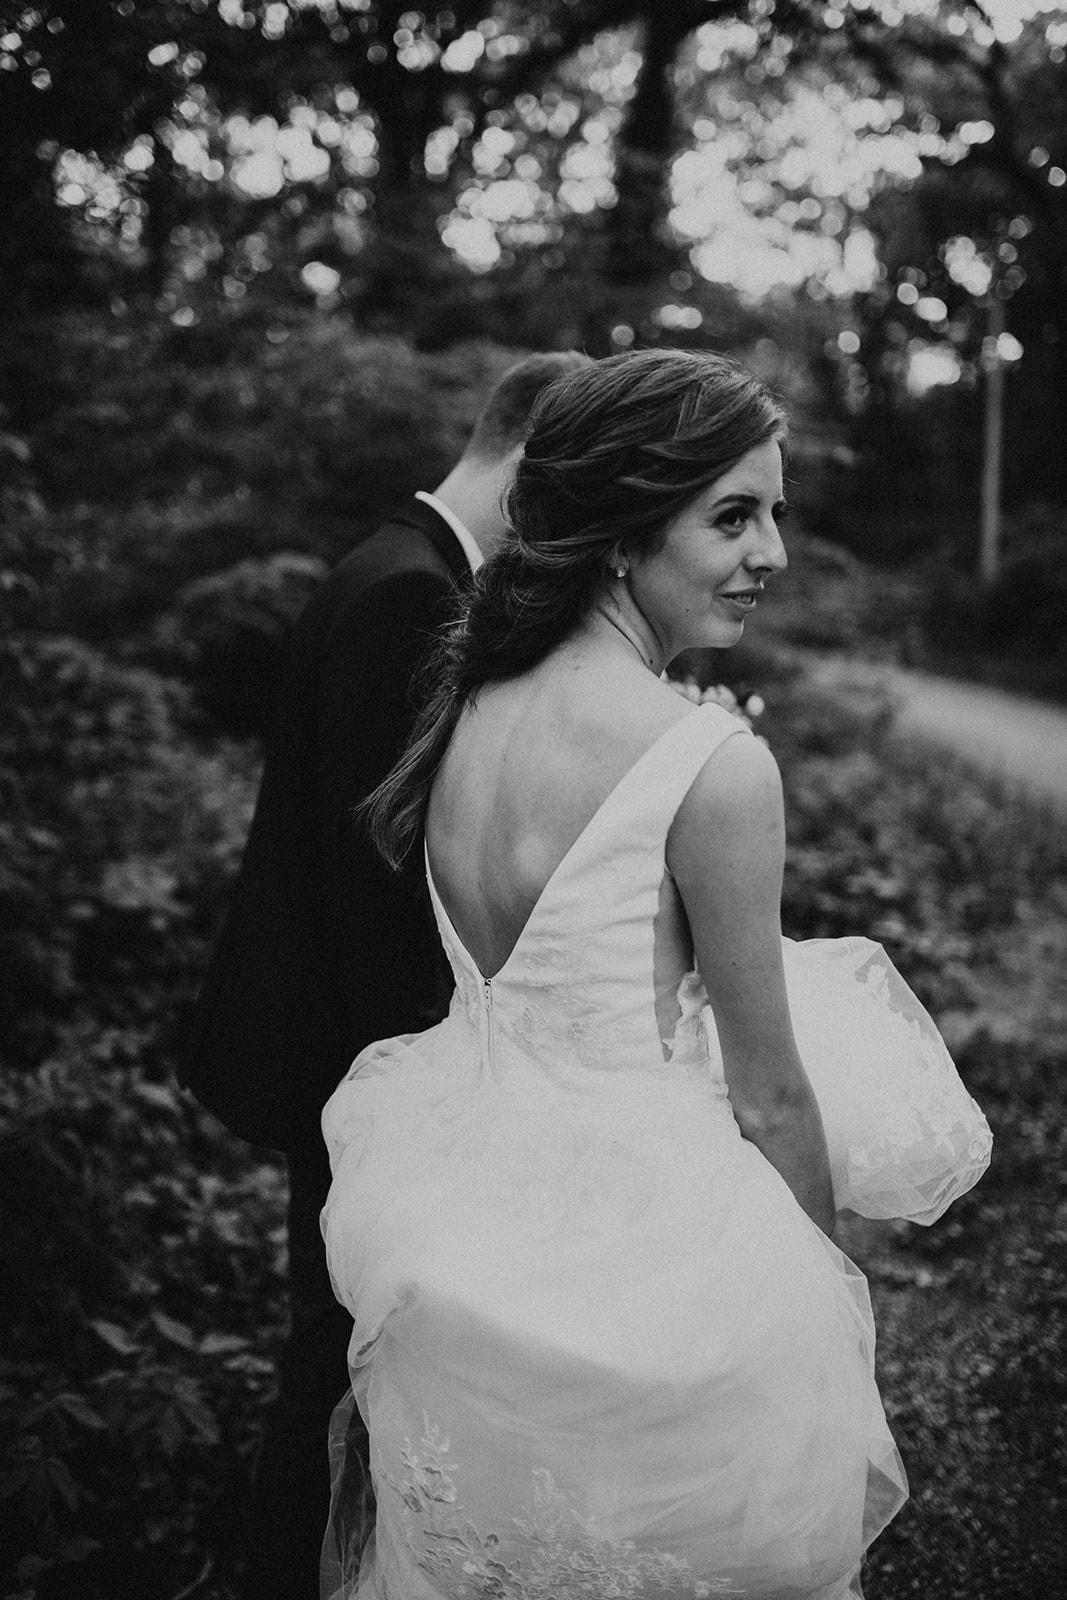 camp_wokanda_peoria_illinois_wedding_photographer_wright_photographs_bliese_0834.jpg